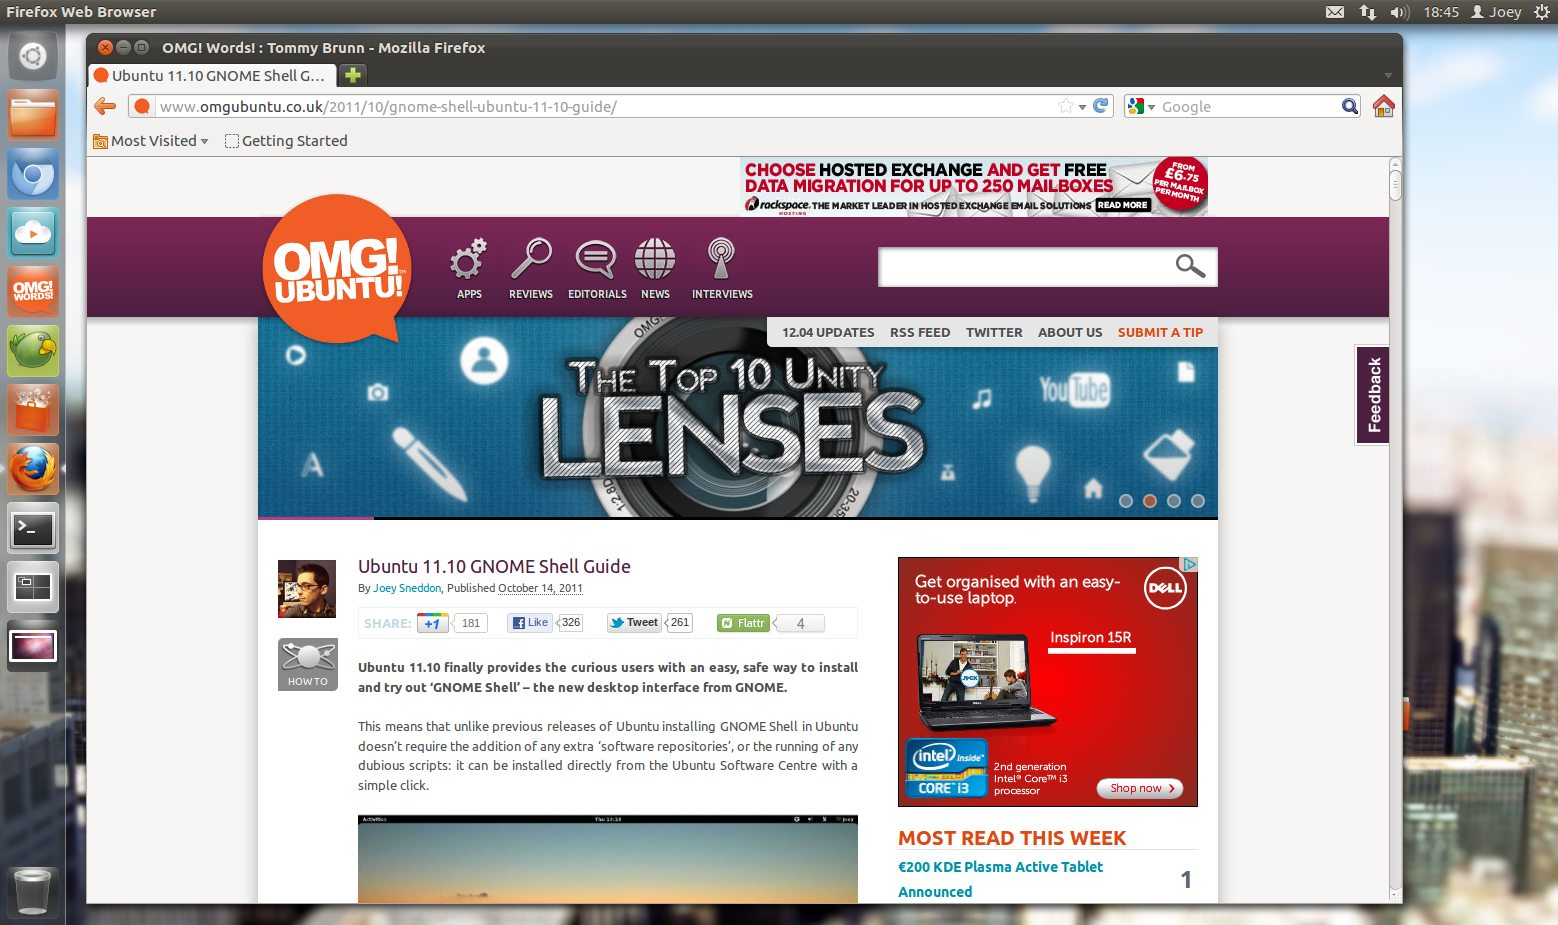 Firefox 10 in Ubuntu 12.04